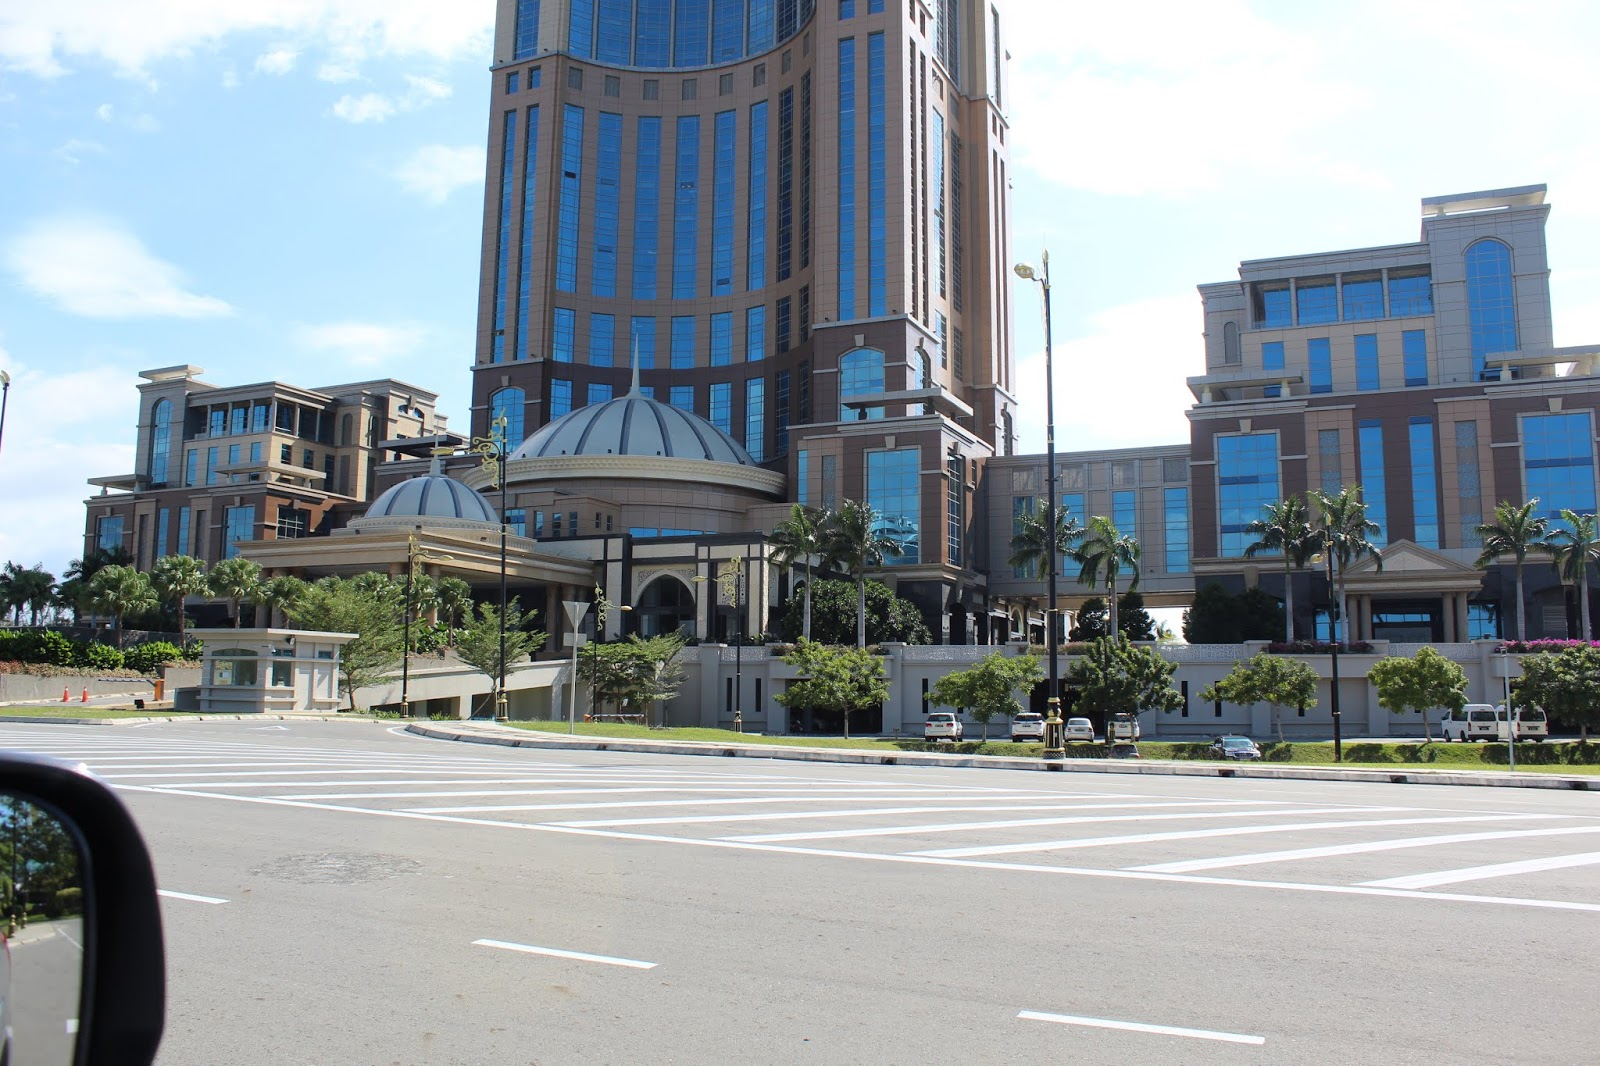 Pusat Pentadbiran Negeri Sabah Tersergam Indah